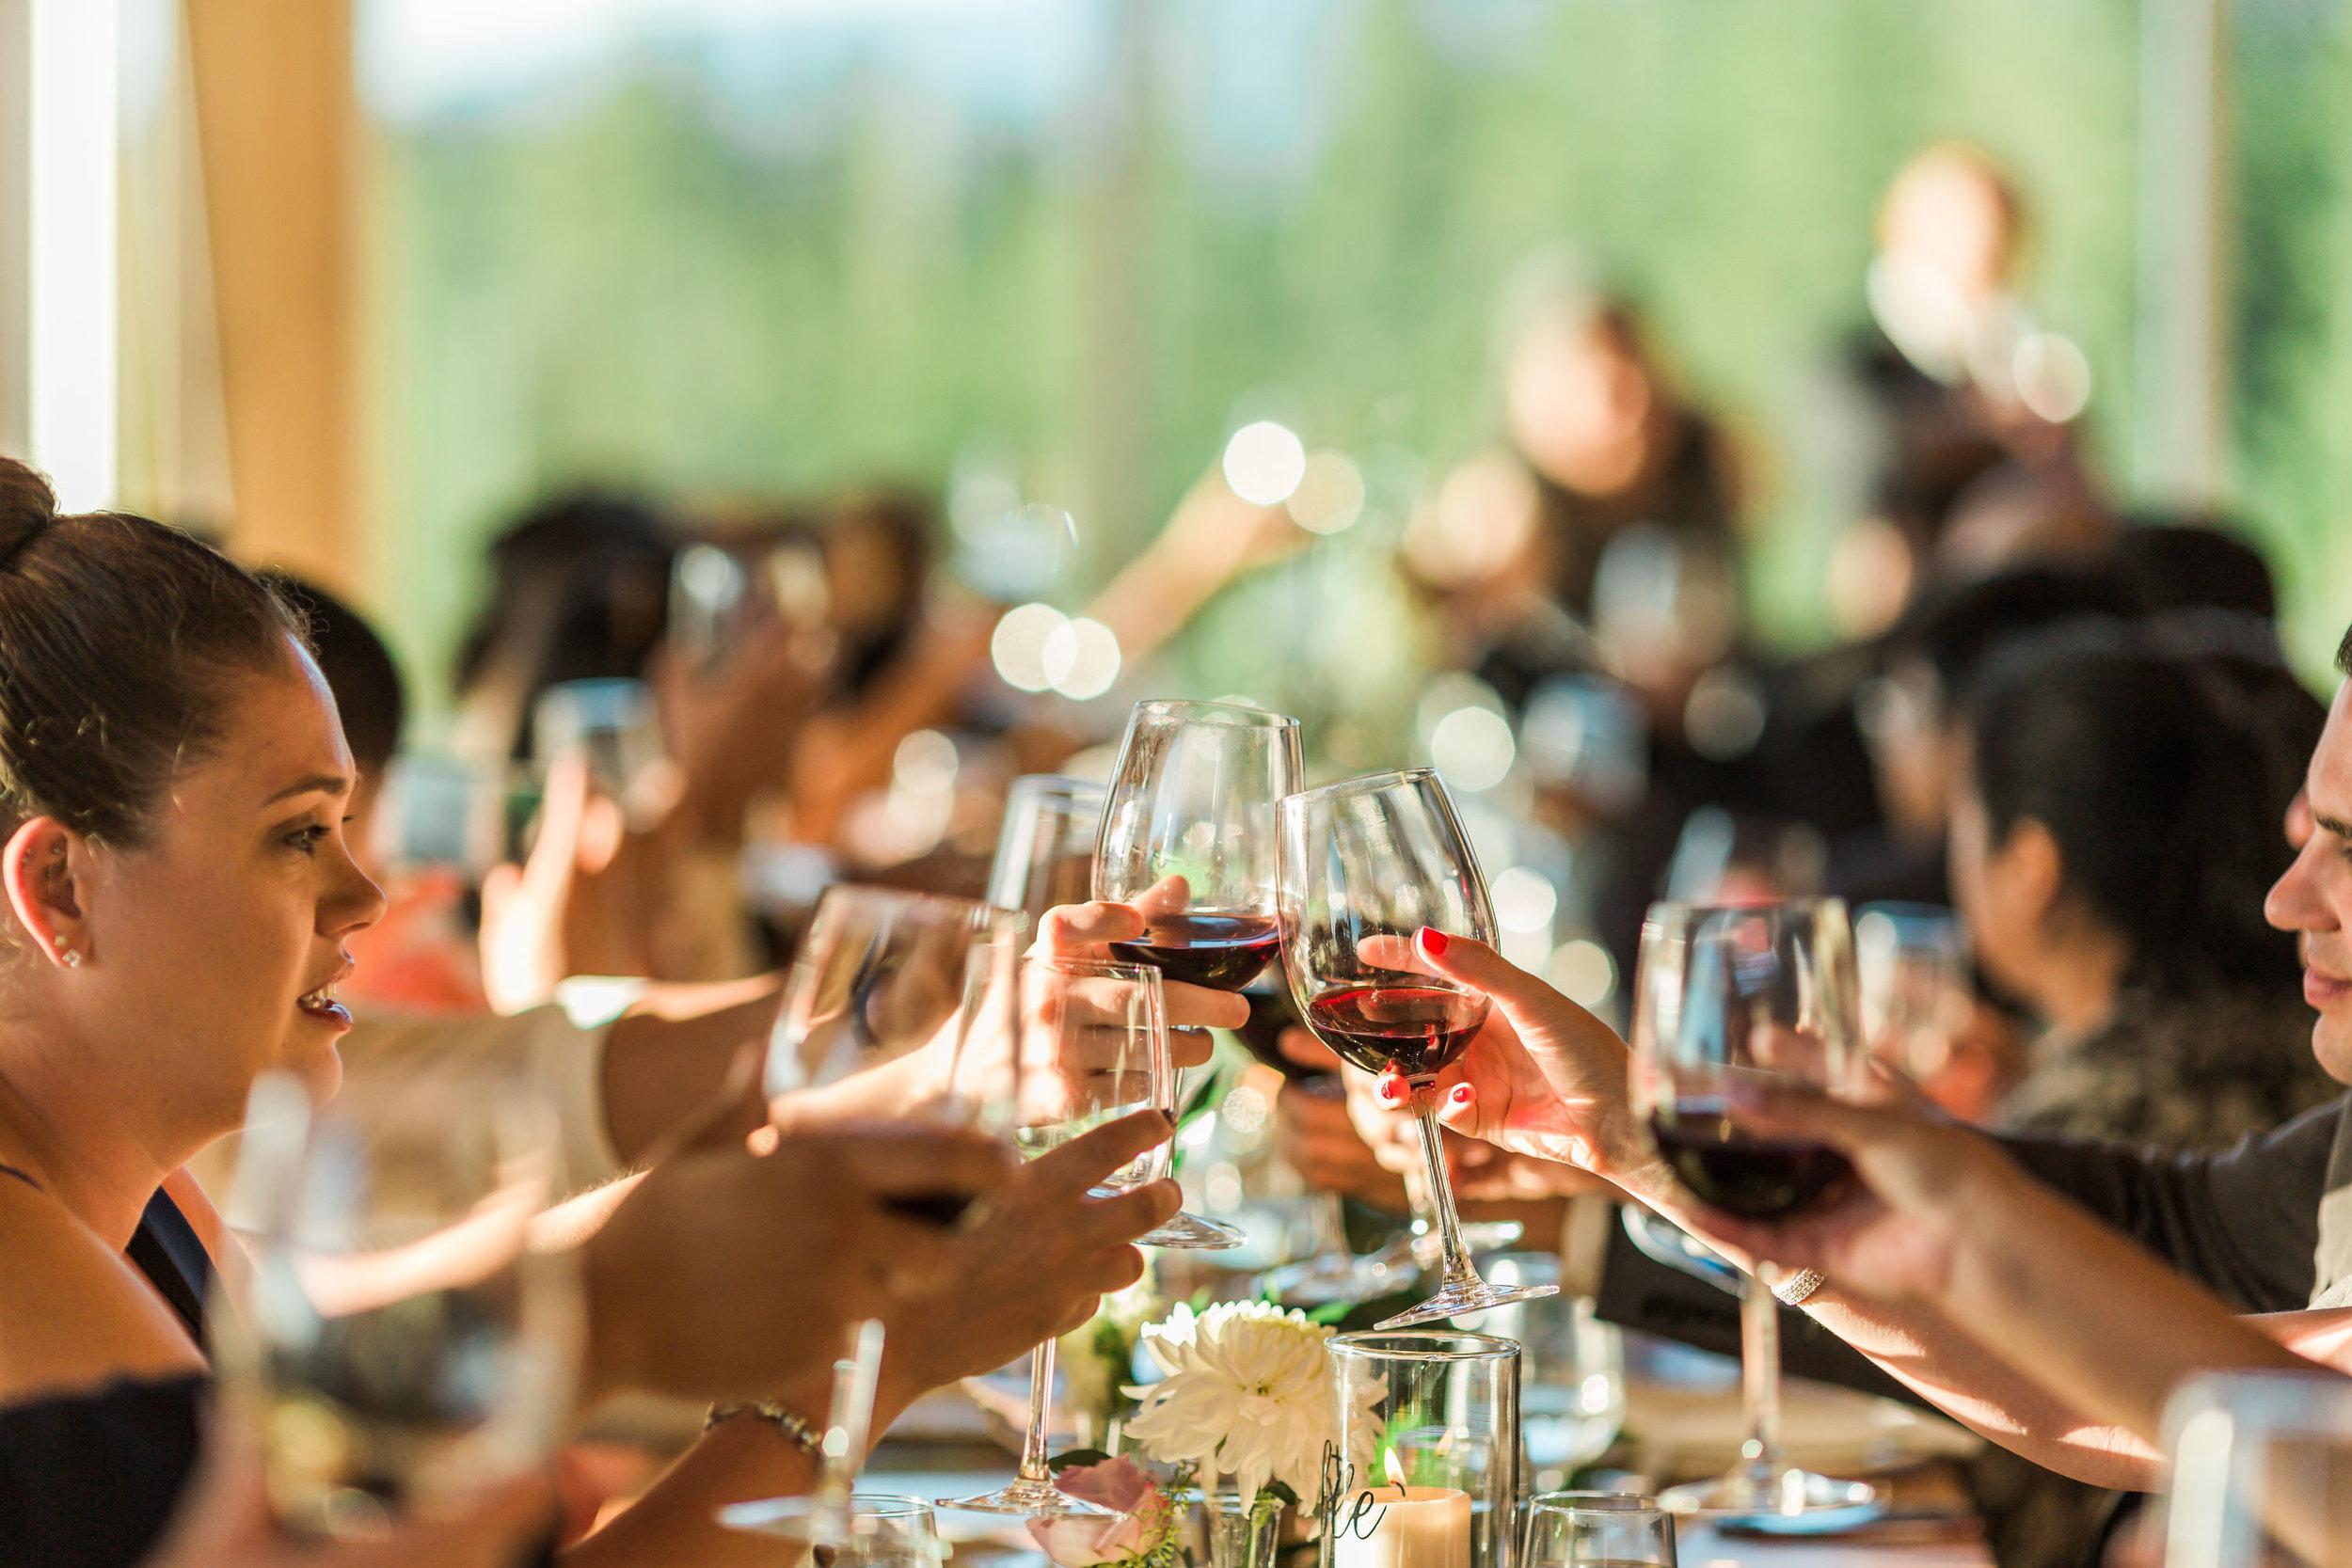 Squamish Wedding Photographer - Sea to Sky Gondola Wedding Photos -  Vancouver Wedding Photographer & Videographer - Sunshine Coast Wedding Photos - Sunshine Coast Wedding Photographer - Jennifer Picard Photography - IMG_4801.jpg